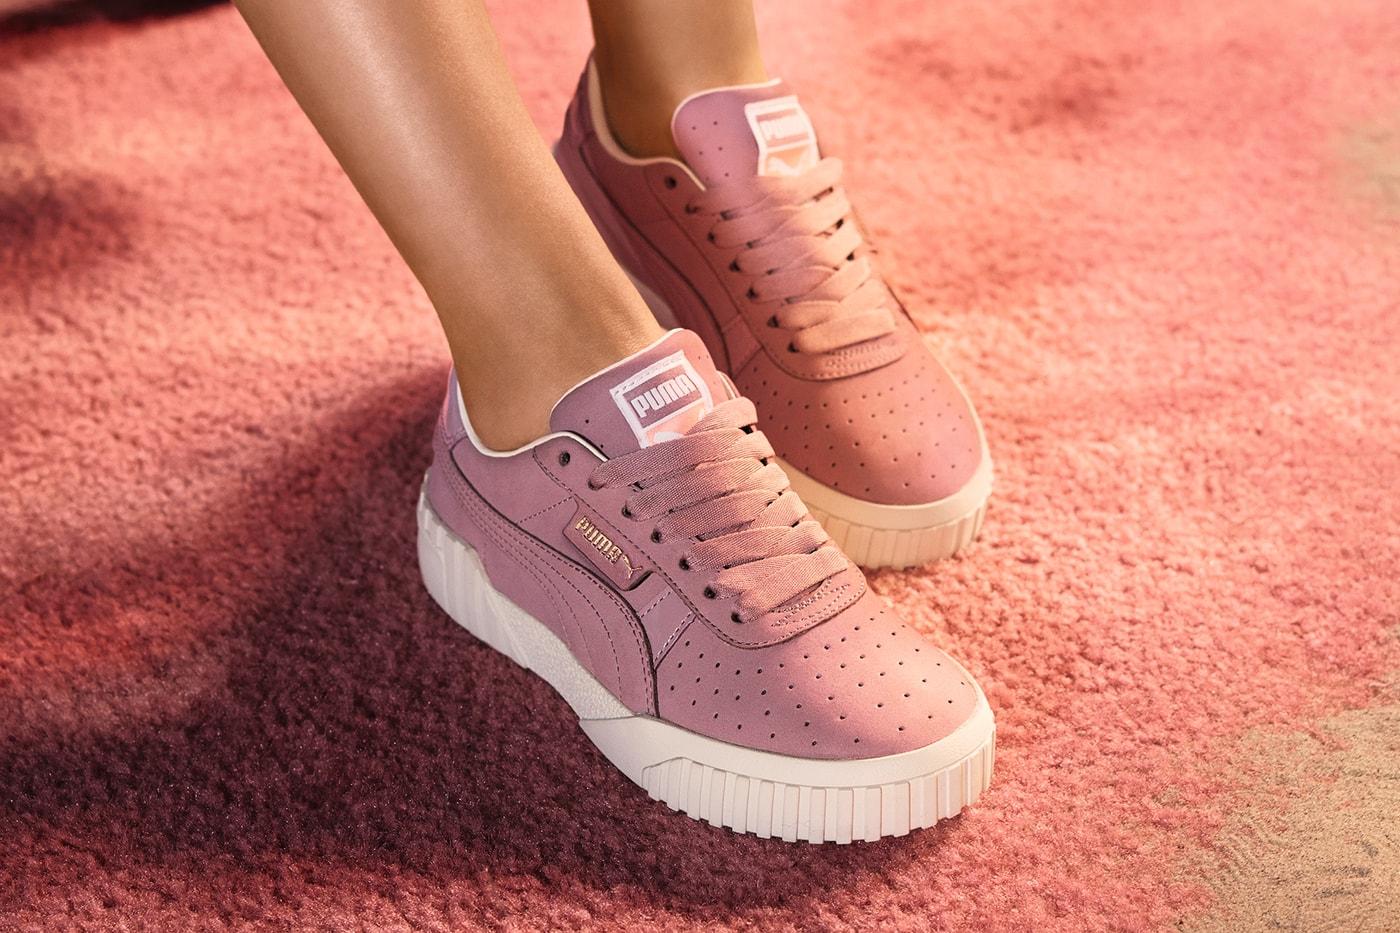 d9e12046e ... Selena Gomez PUMA Cali Elderberry Pastel Dusky Lilac Sneakers Trainers